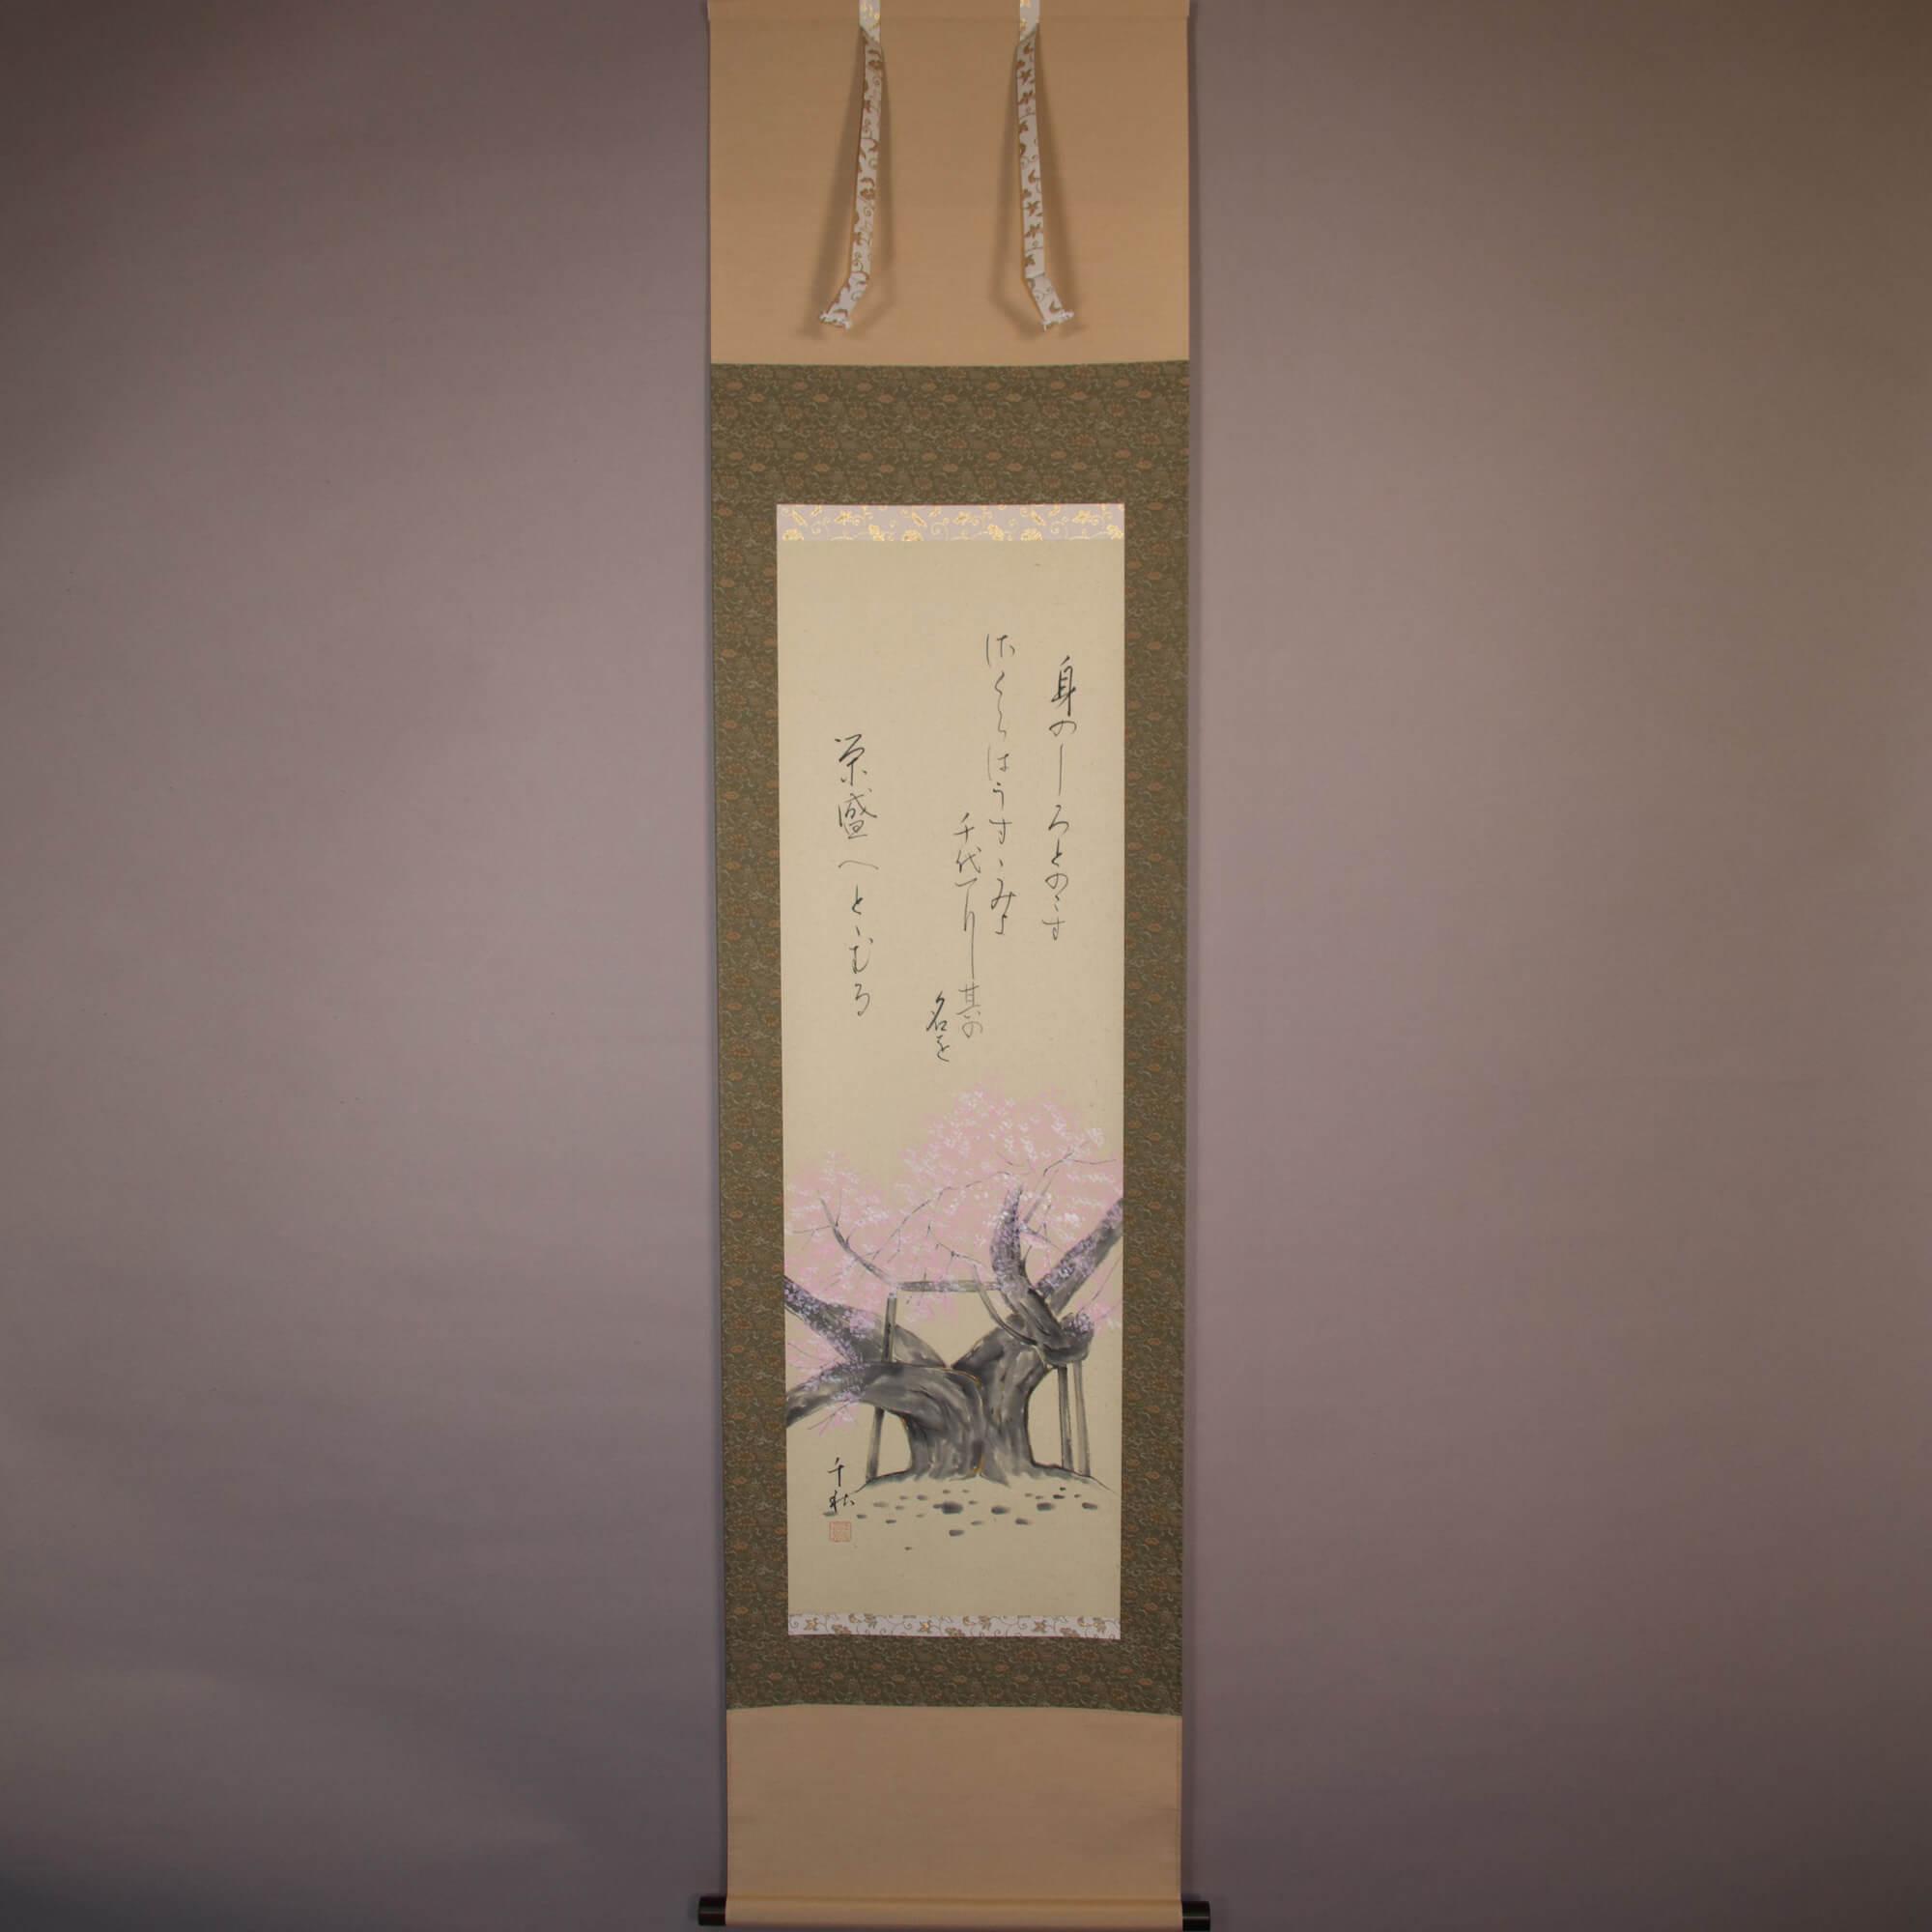 Usuzumi Zakura (Light-Ink Cherry Blossom) / Oguri Senshū